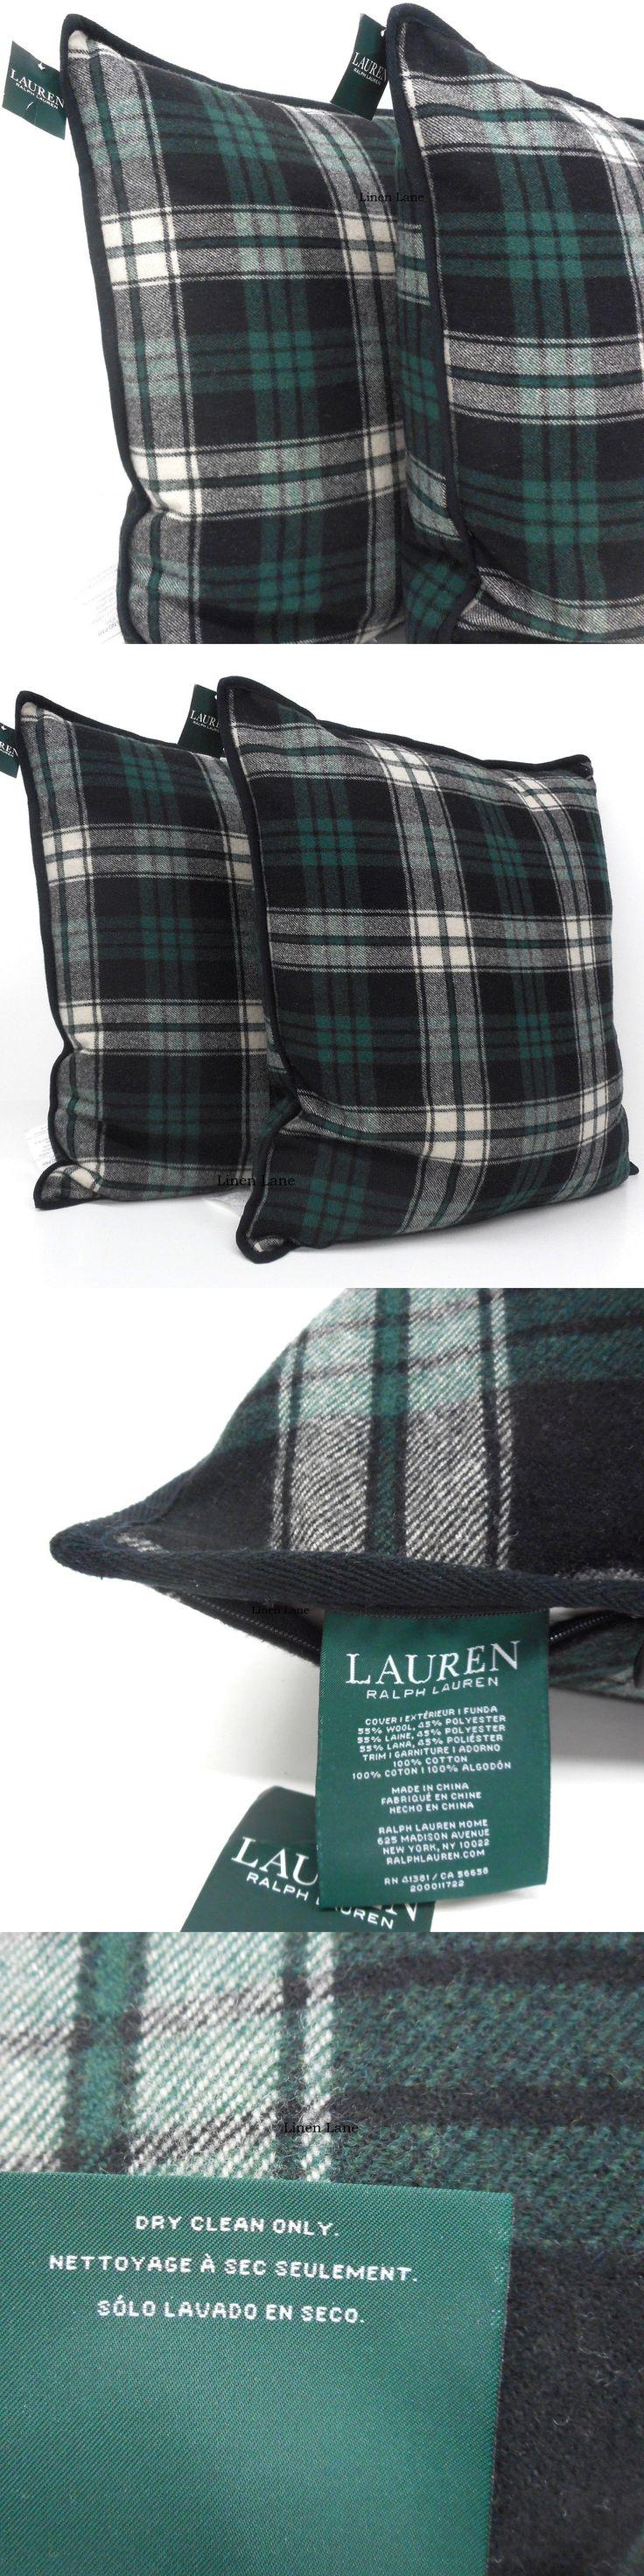 Decorative Bed Pillows 115630: Ralph Lauren Tartan Plaid Throw Pillow Set Of 2 Nwt Green Black Ivory Wool Blend -> BUY IT NOW ONLY: $144 on eBay!